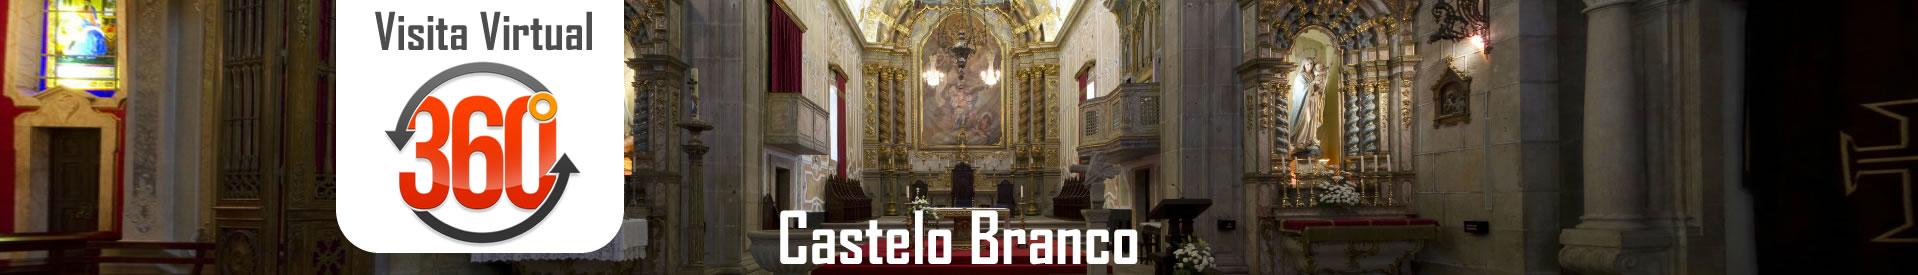 Castelo Branco 360